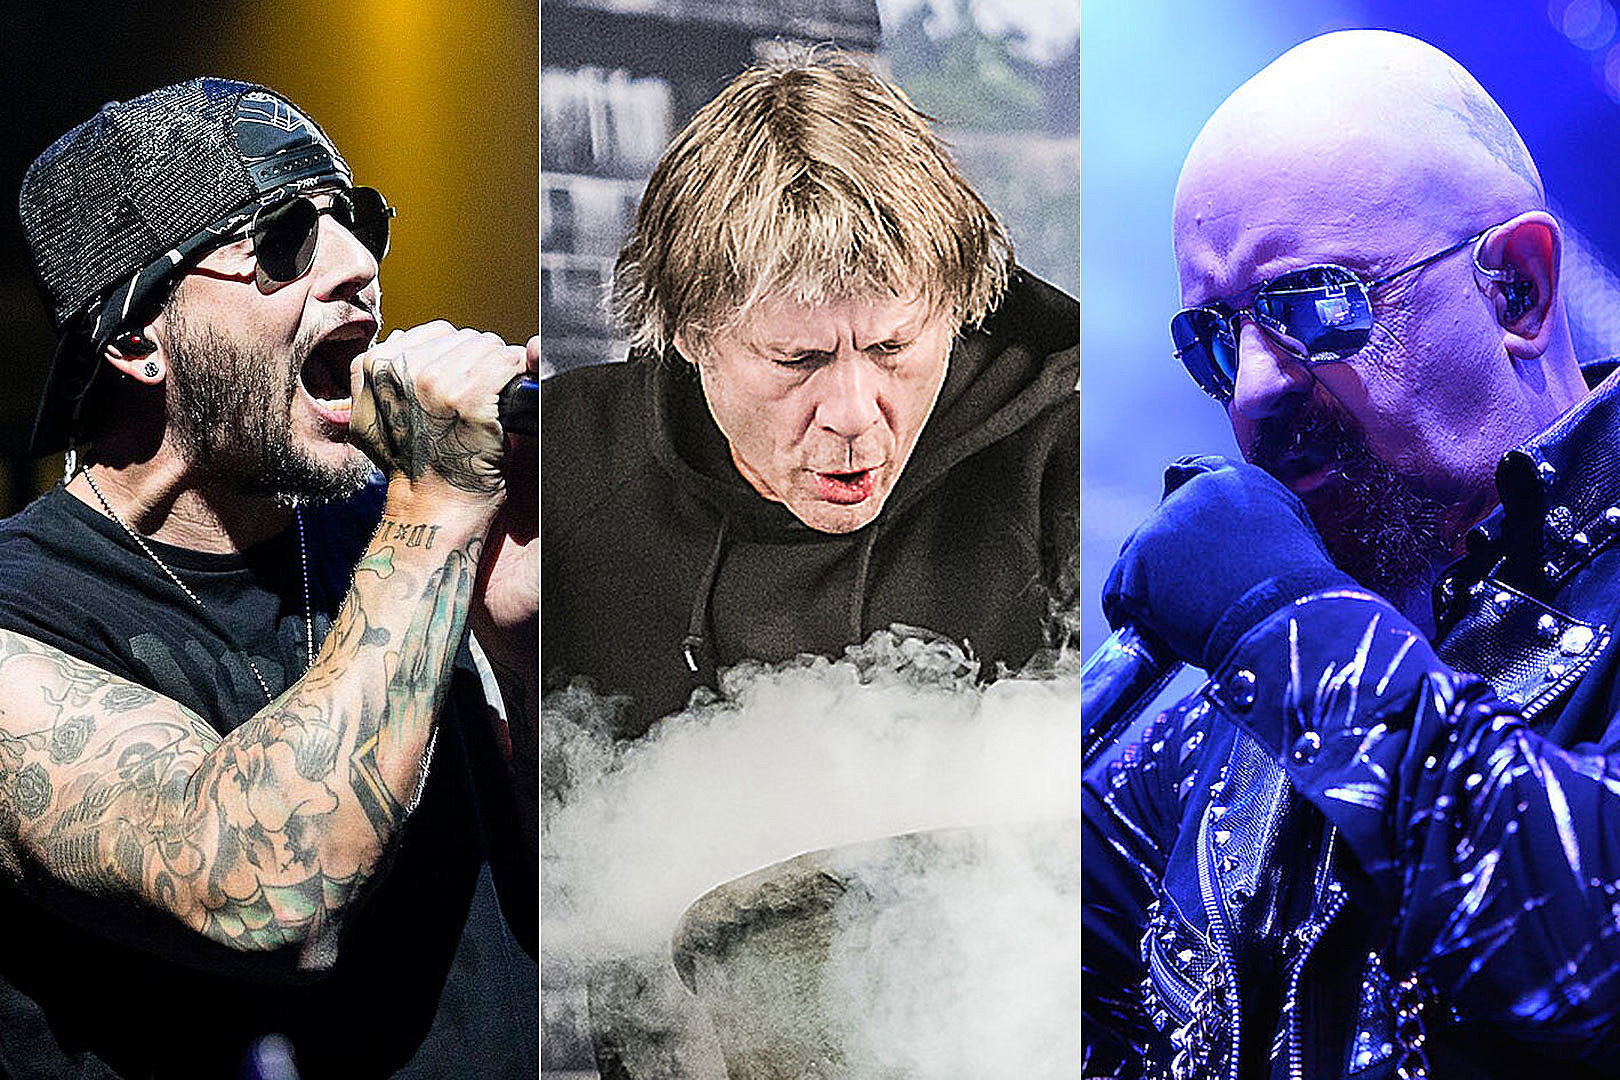 Avenged Sevenfold, Iron Maiden + Judas Priest to Headline France's 2018 Hellfest